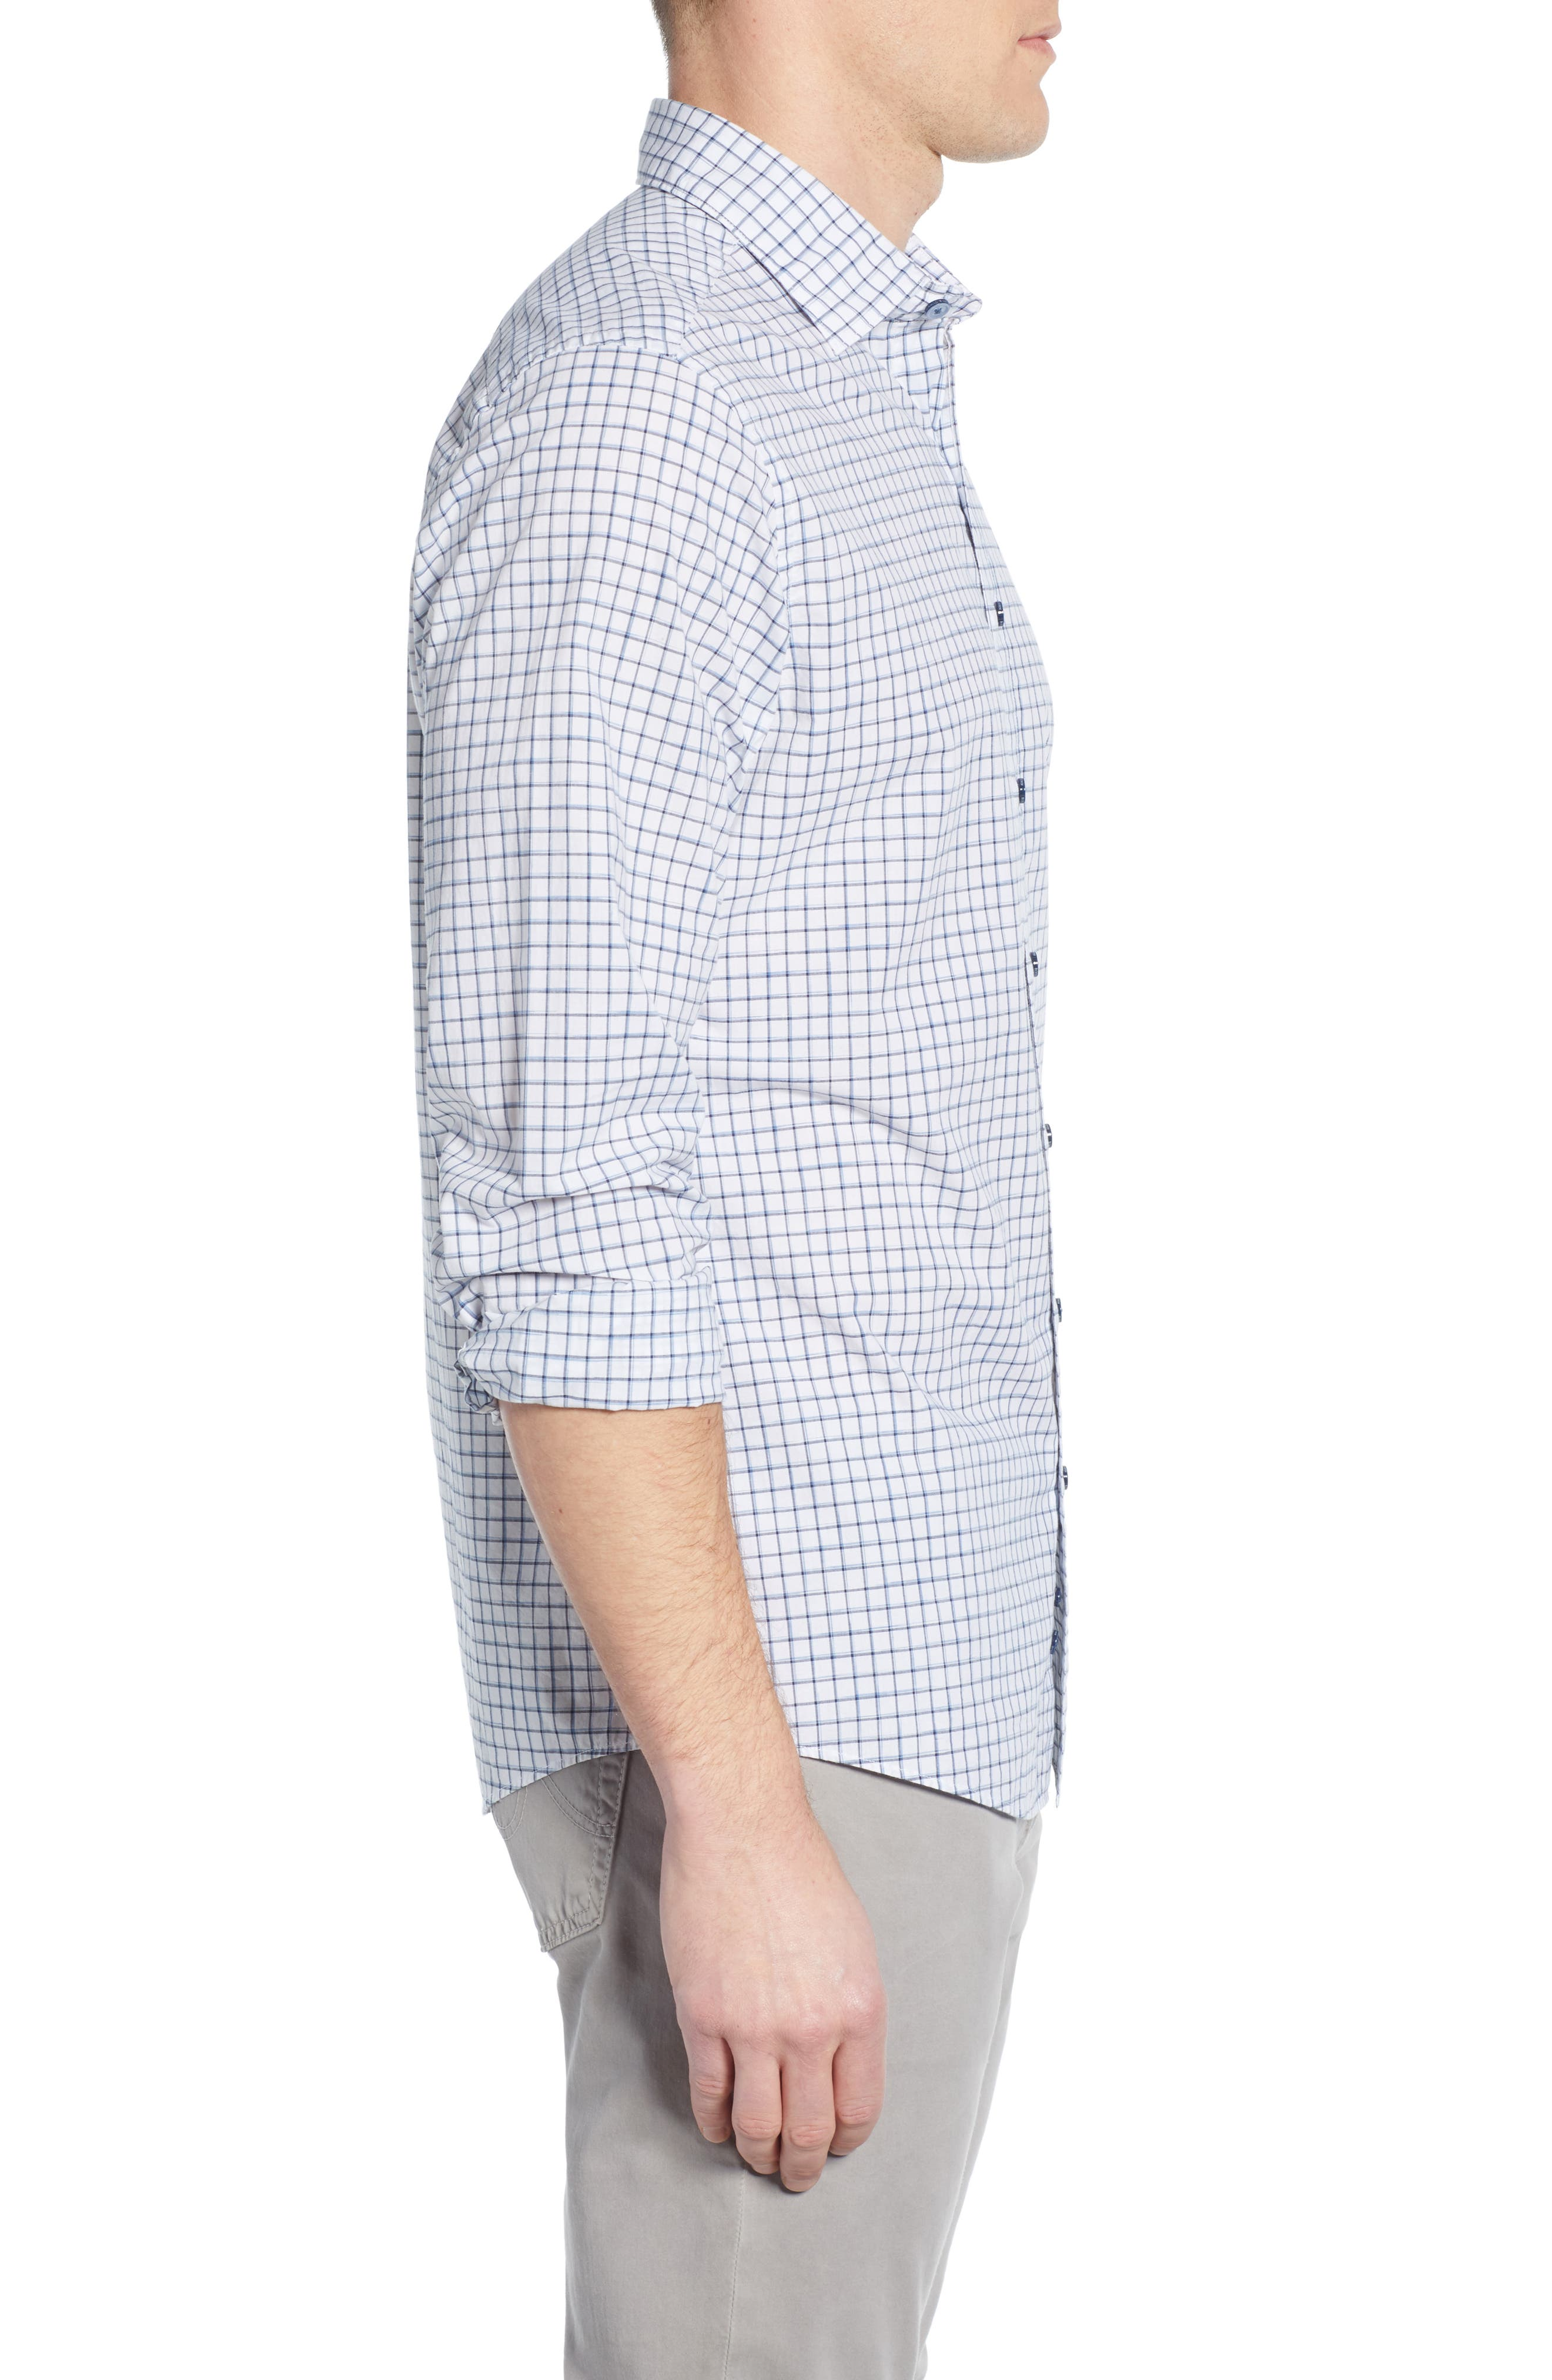 RODD & GUNN, Gowerville Regular Fit Check Sport Shirt, Alternate thumbnail 4, color, SNOW